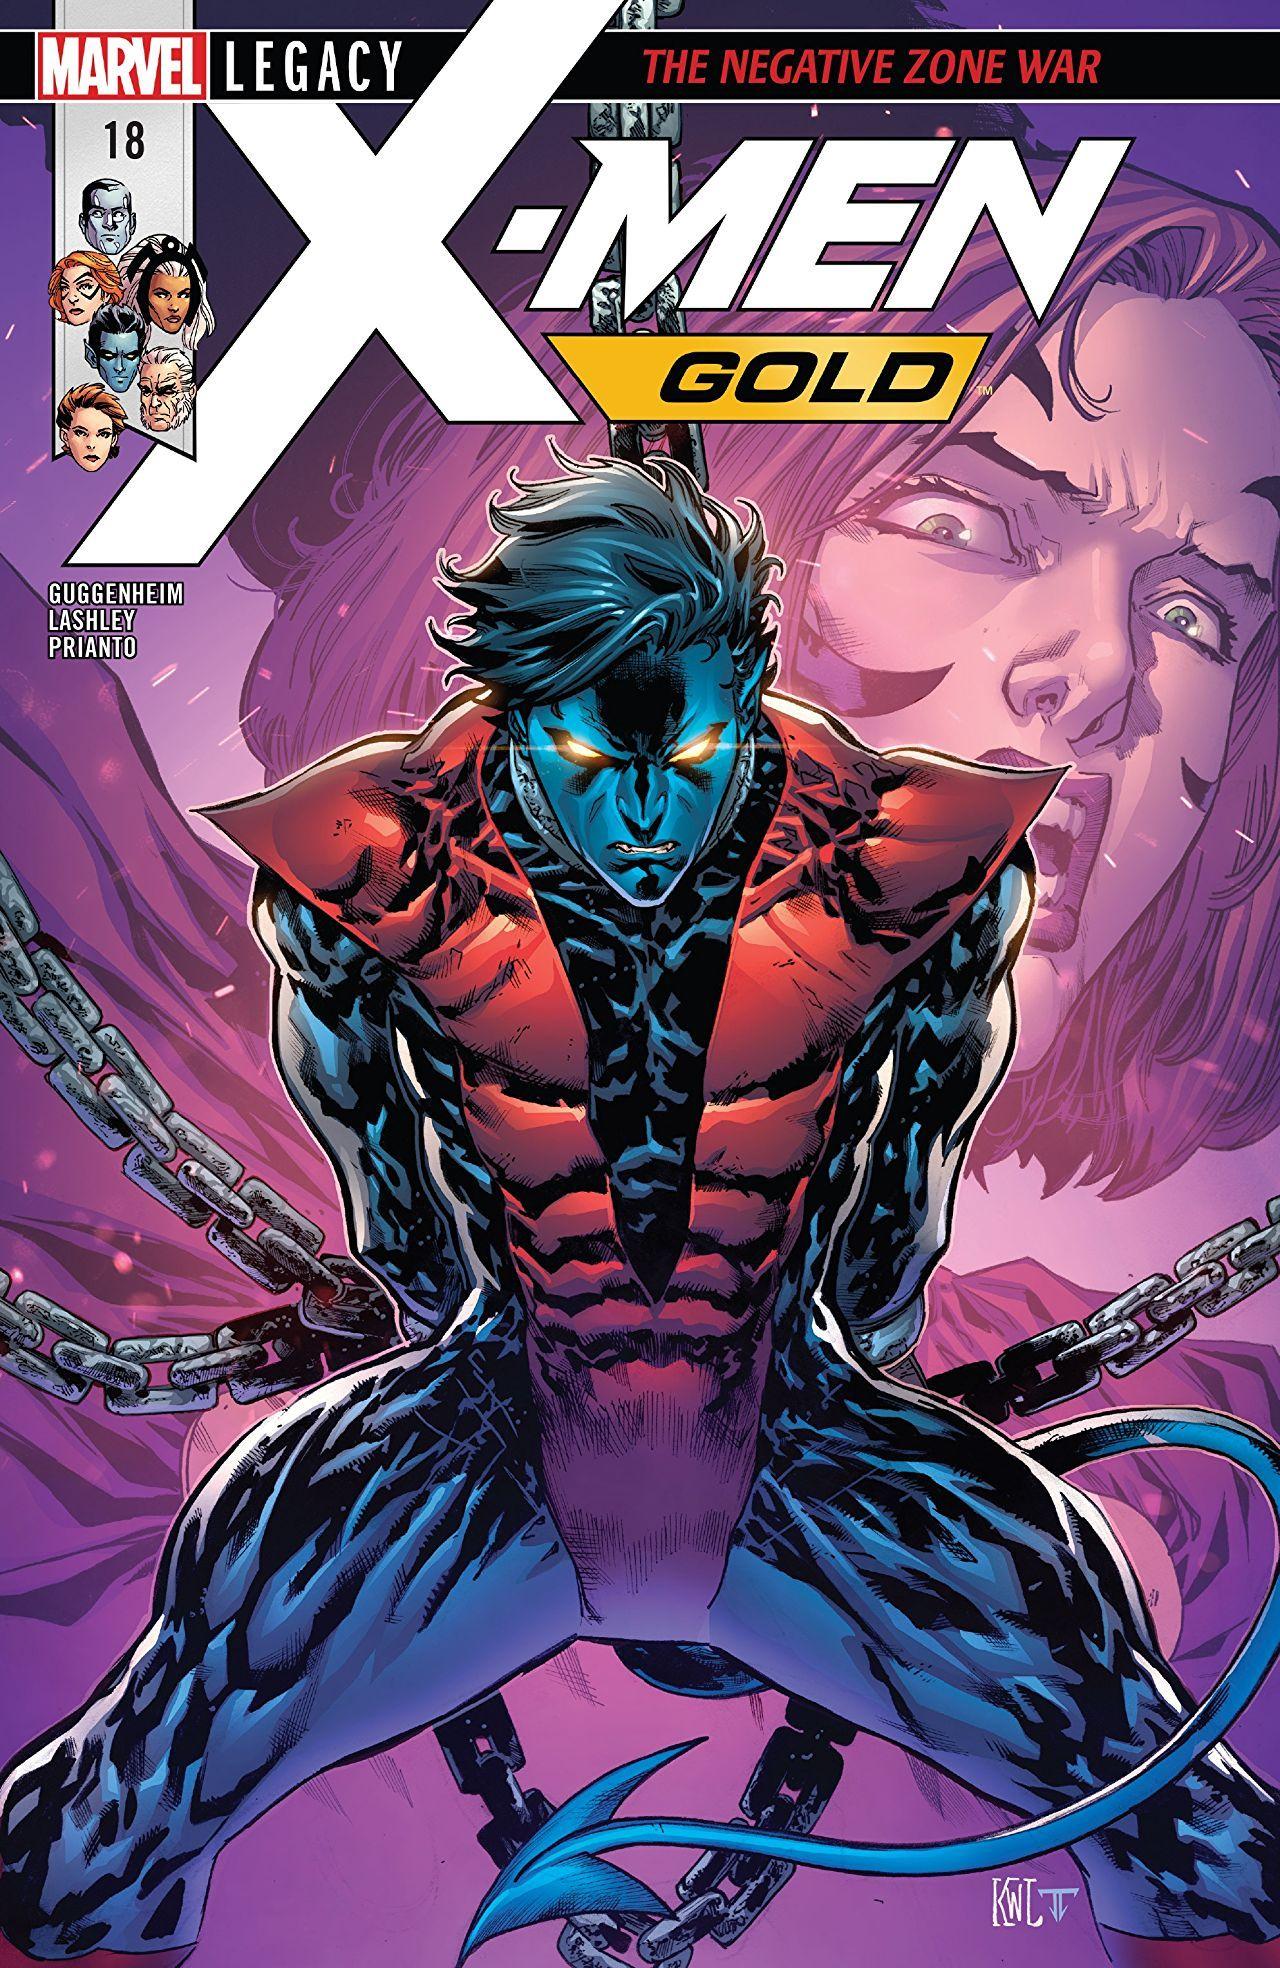 Pin On Marvel Comics